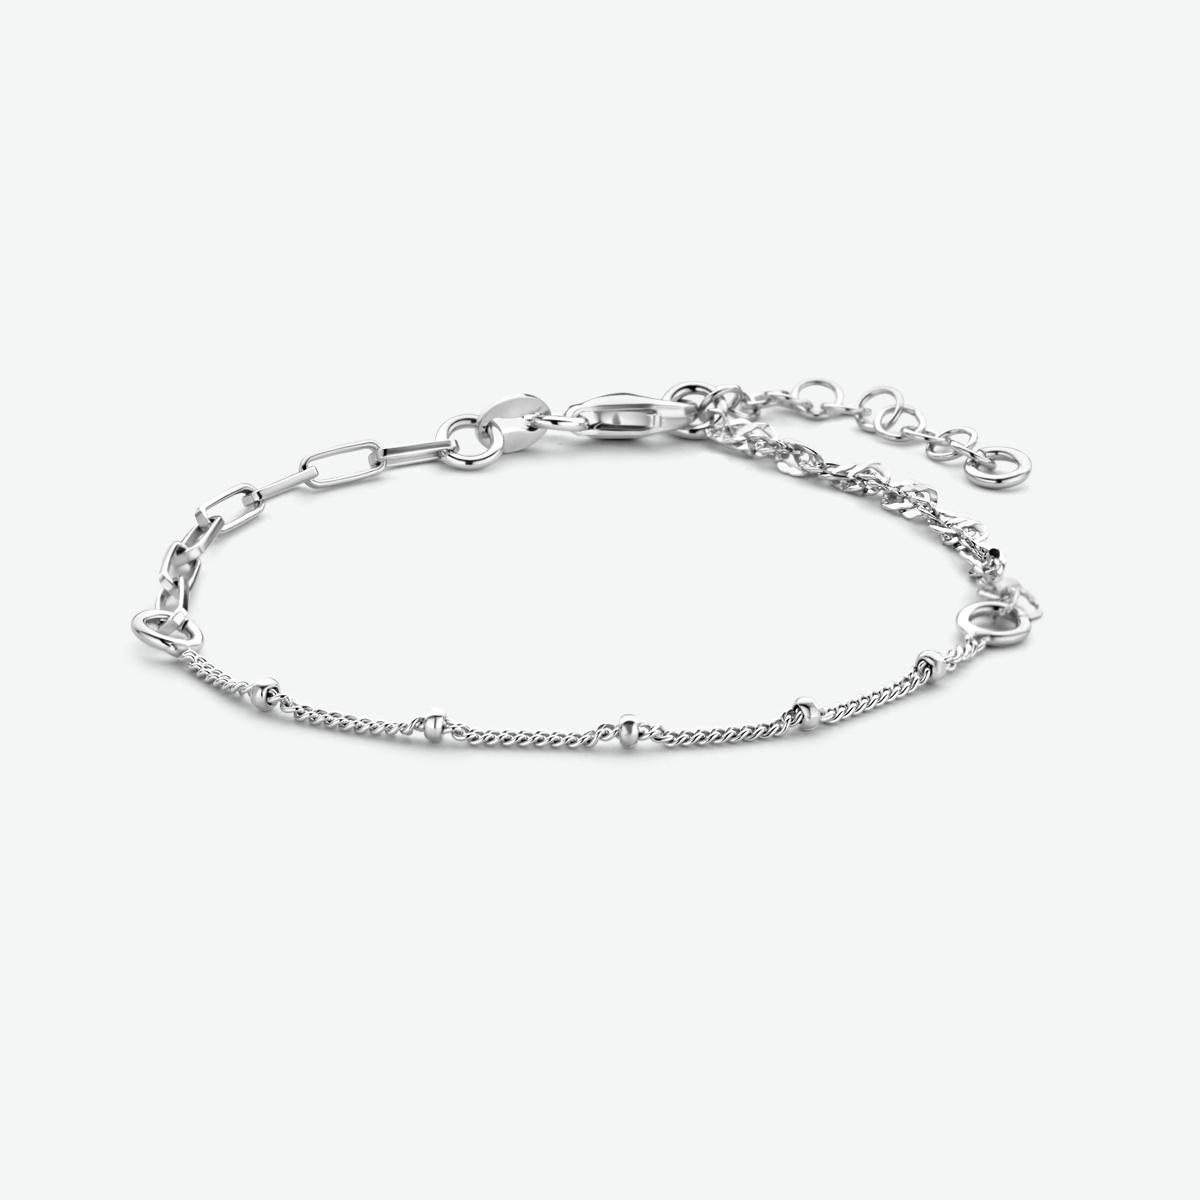 Bracelet Links - Sterling Silver